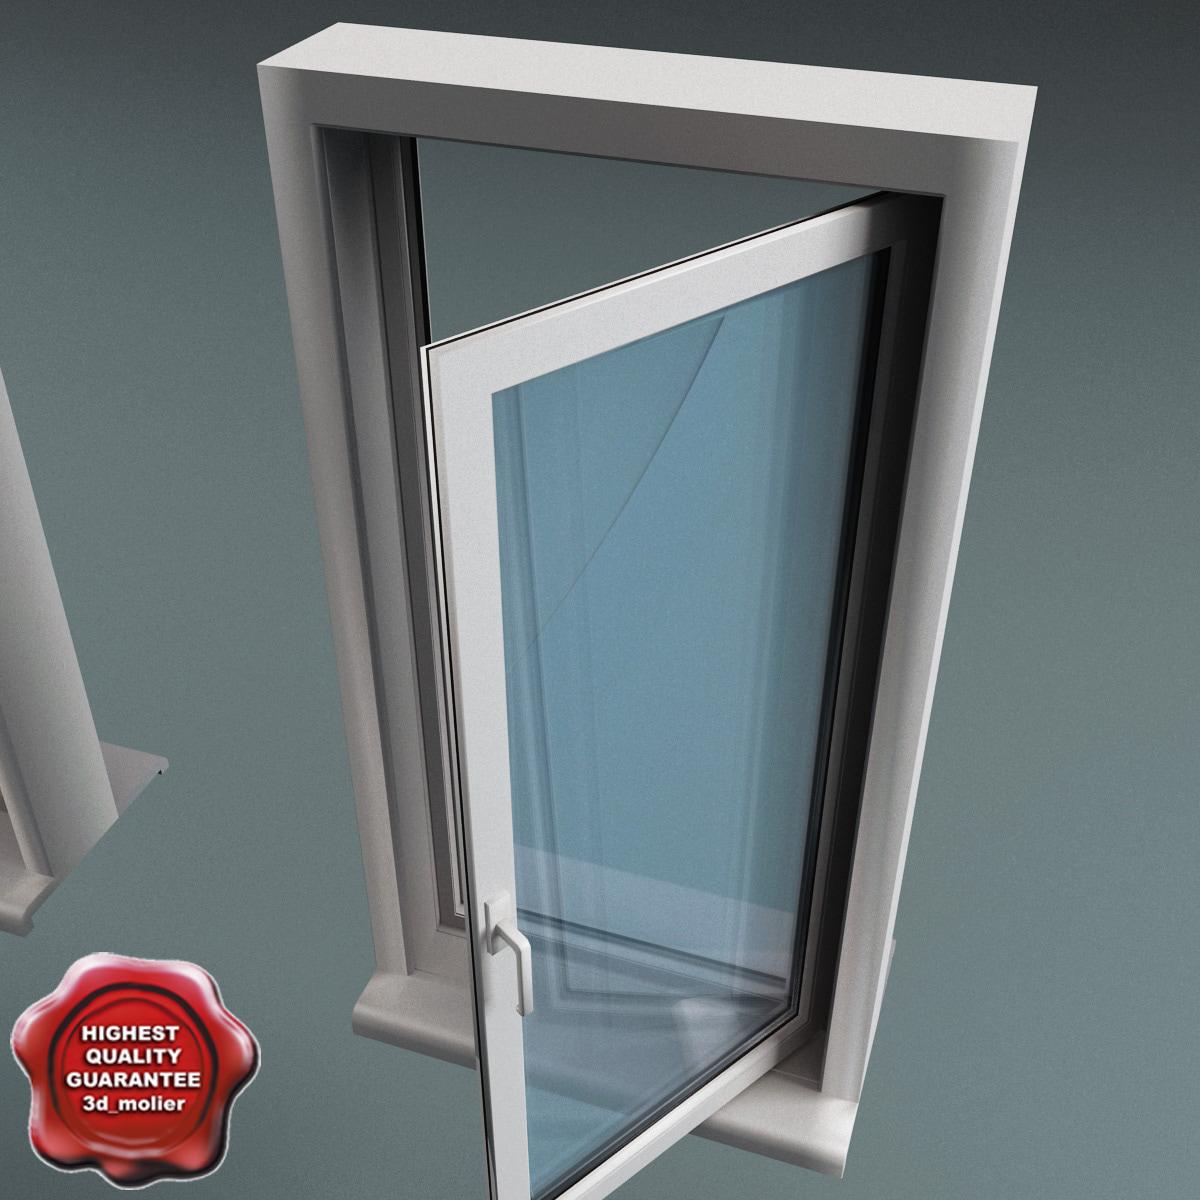 plastic window v4 3d max